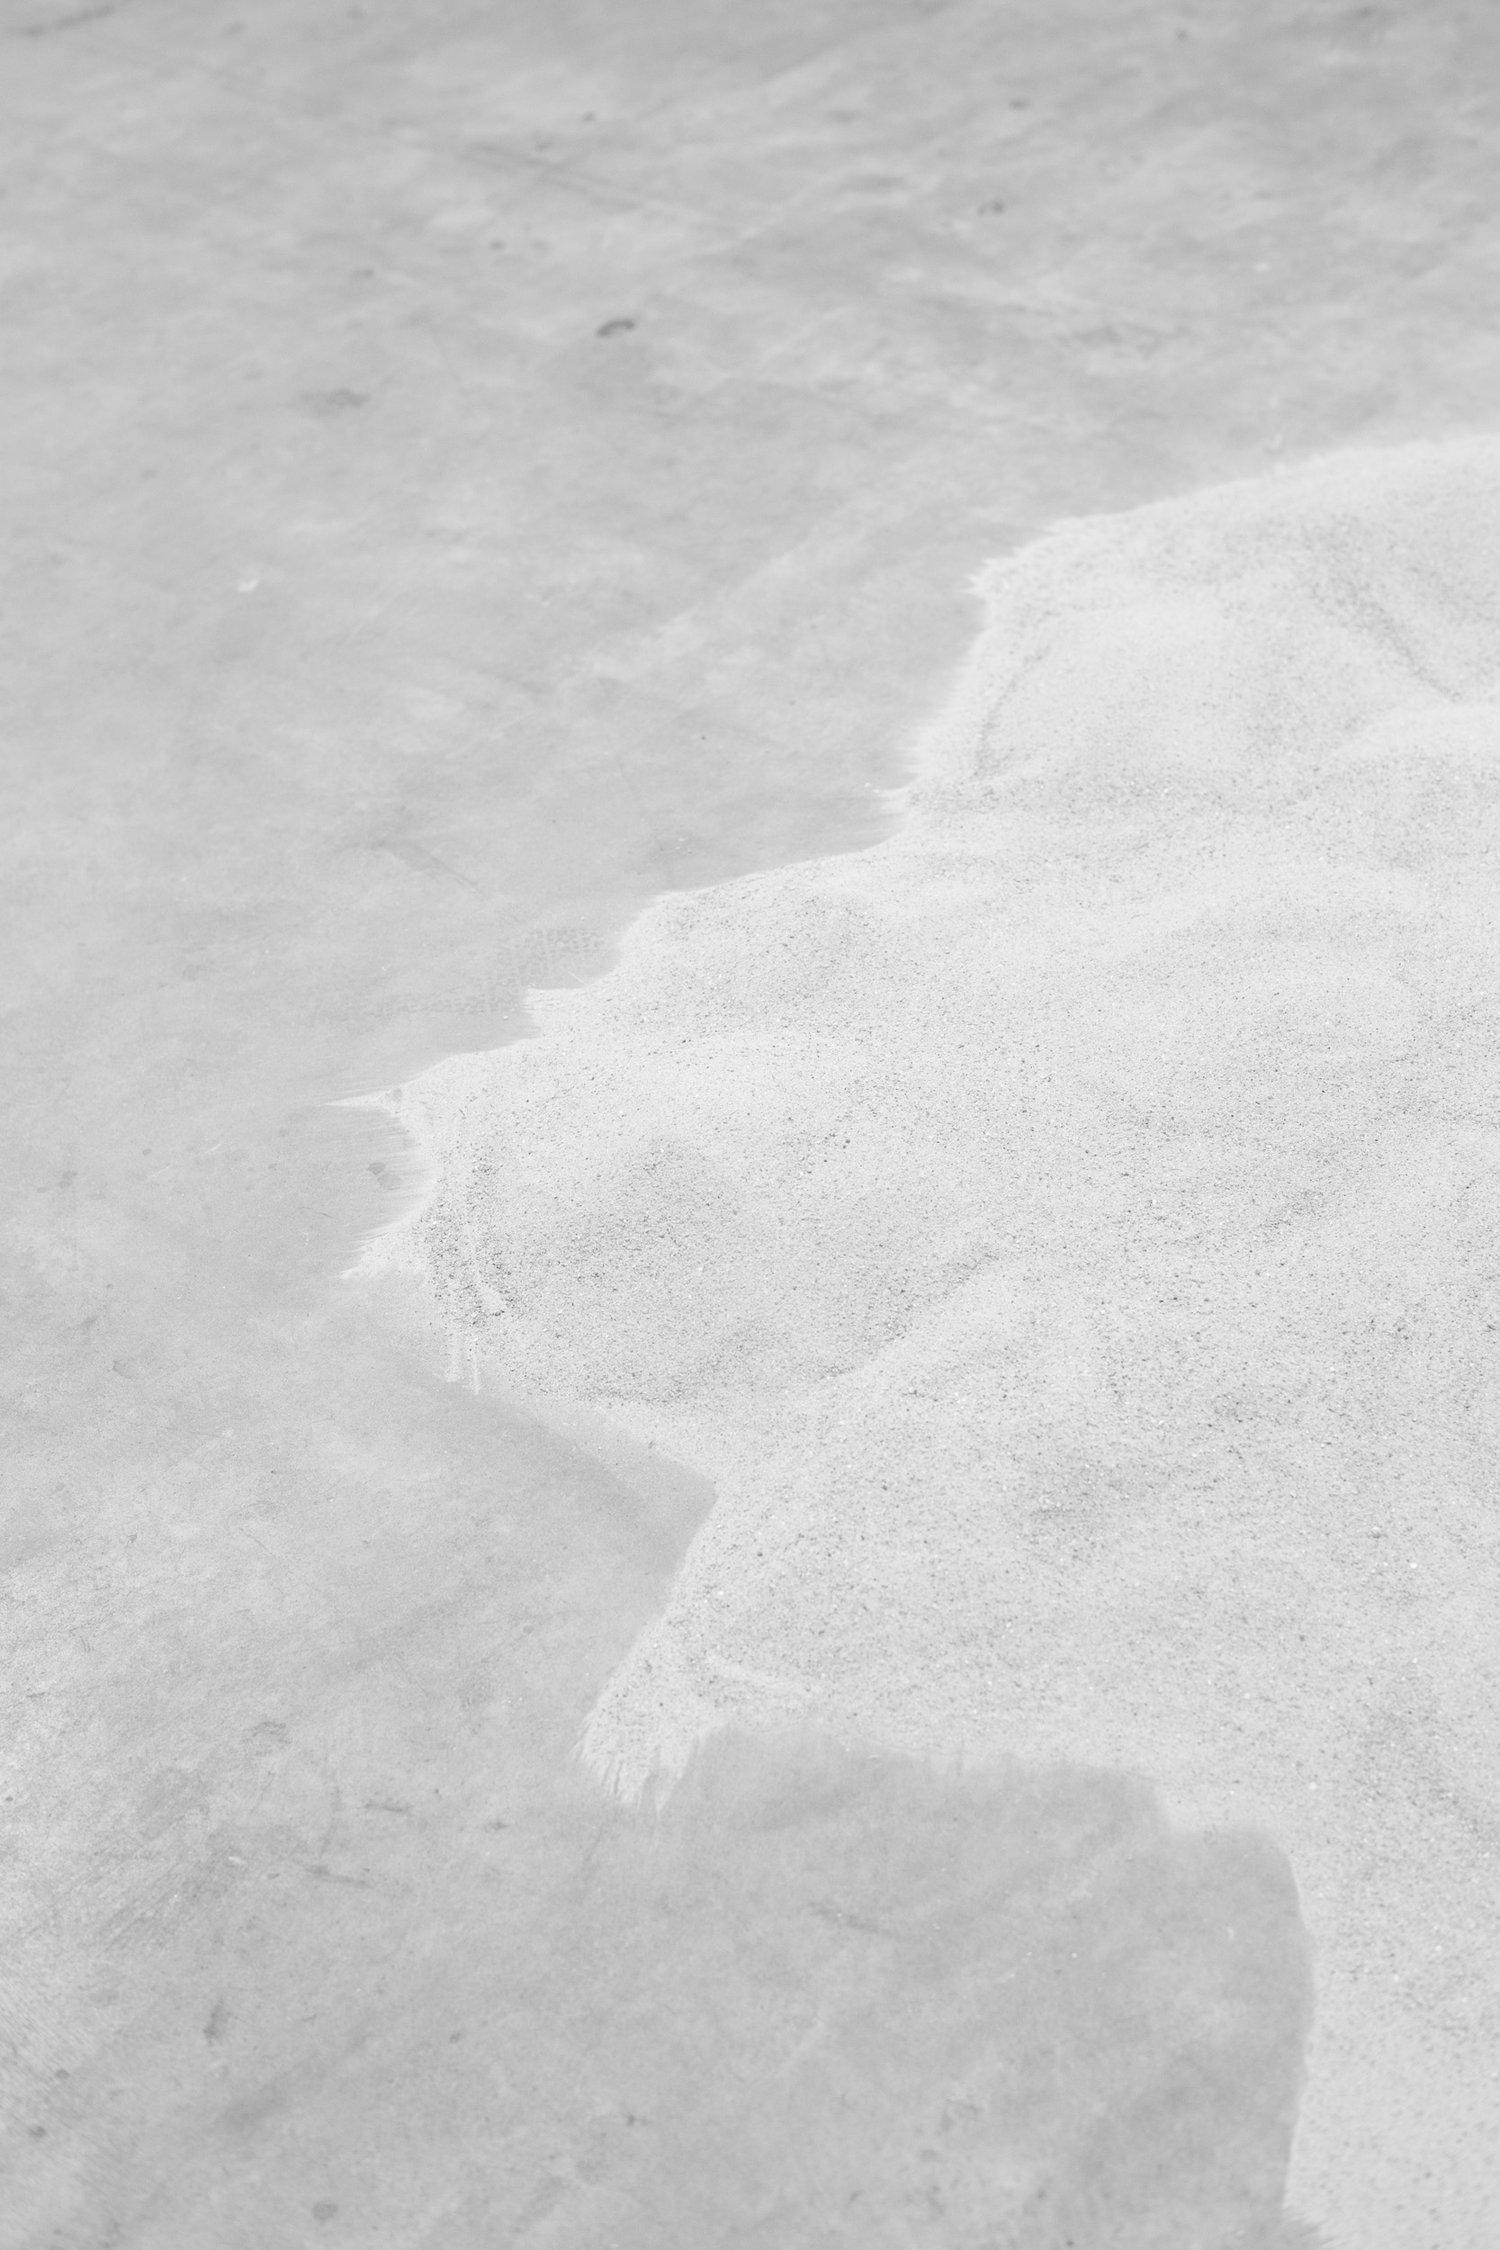 Ikon+Jonathan+Watkins-6.jpg